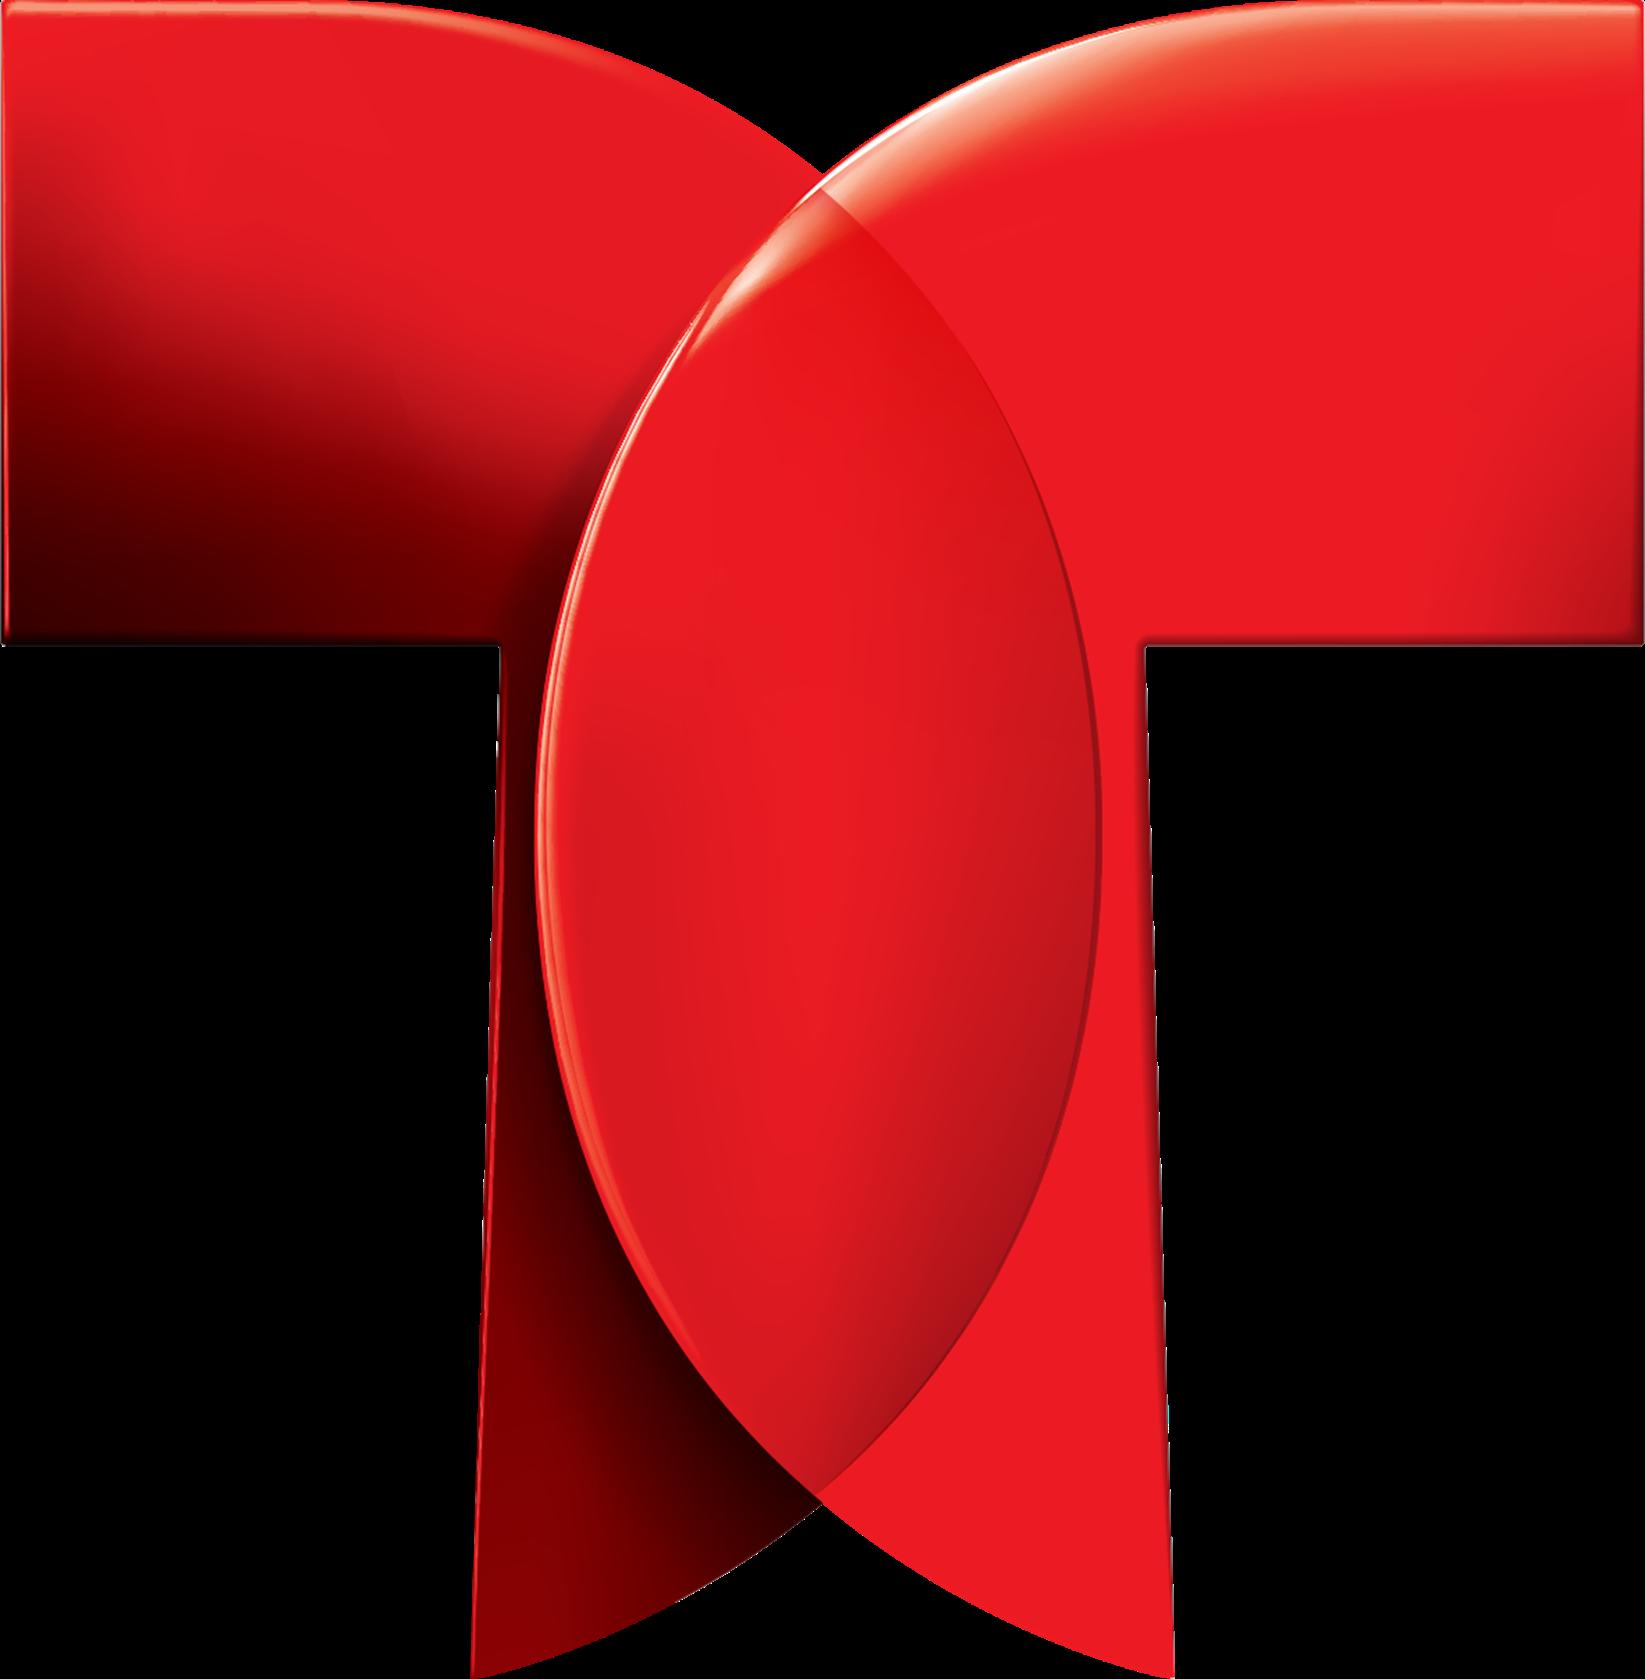 Image Result For Telemundo Logo Telemundo Image Logos